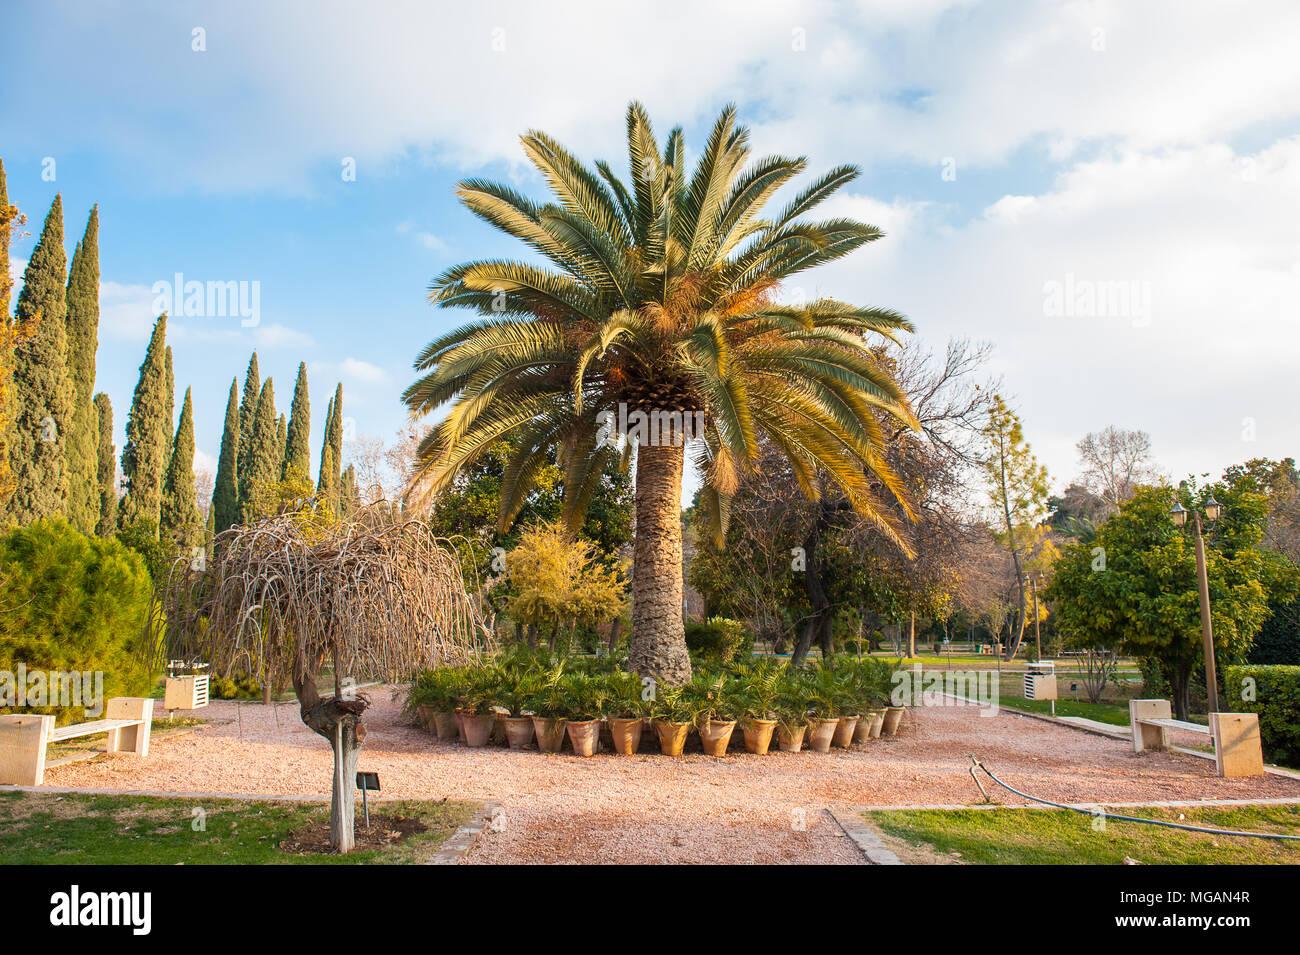 Palm tree in the Eram Garden, historic Persian garden in Shiraz ...